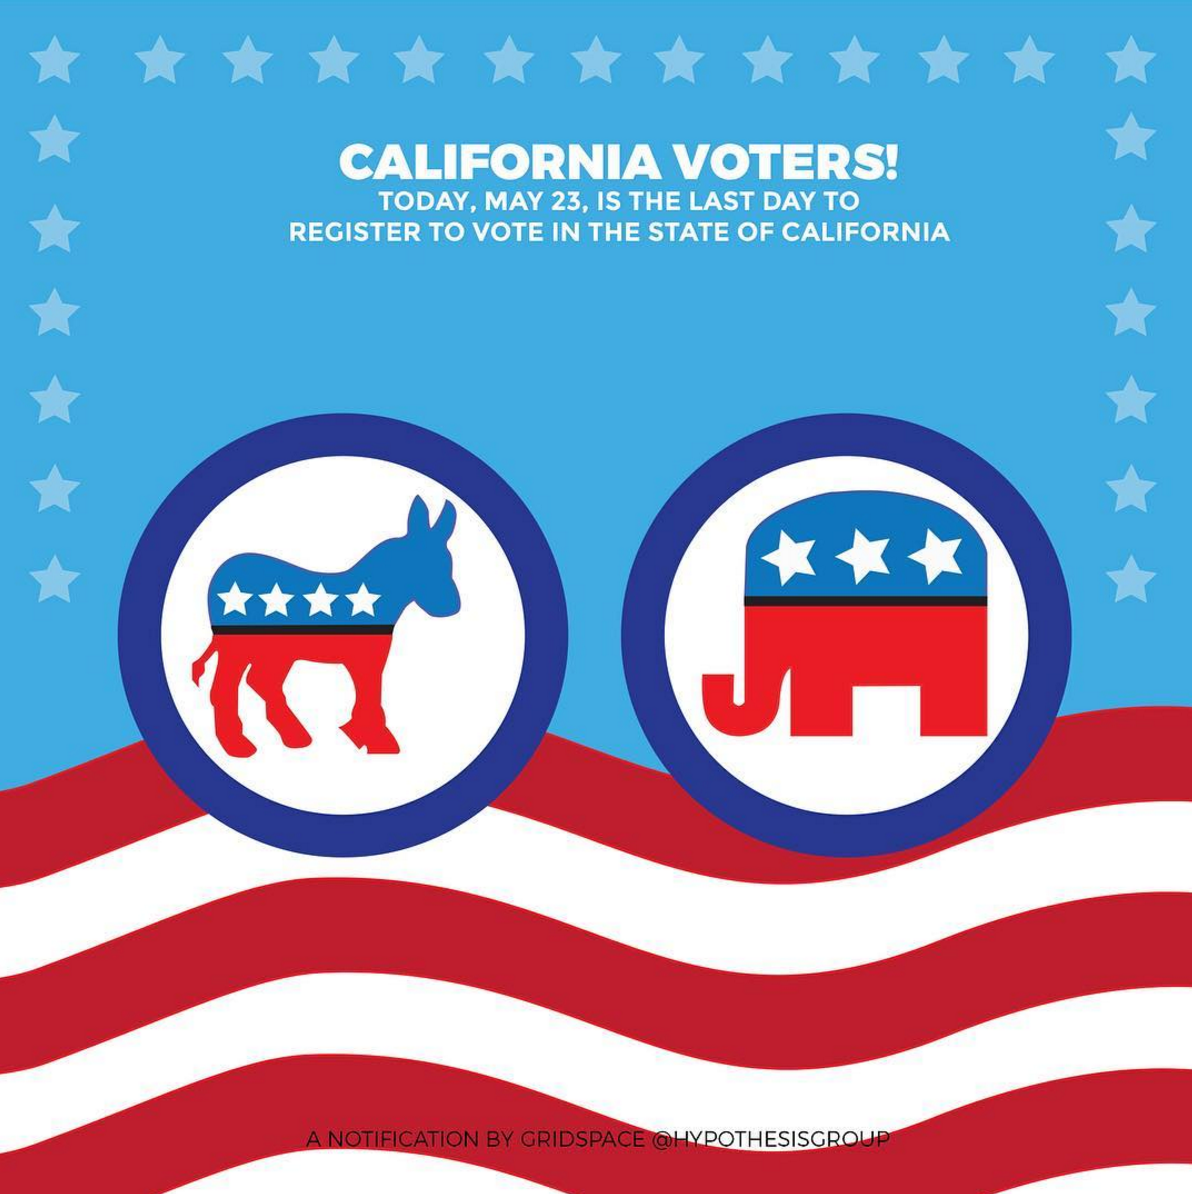 California Voter Registration Day